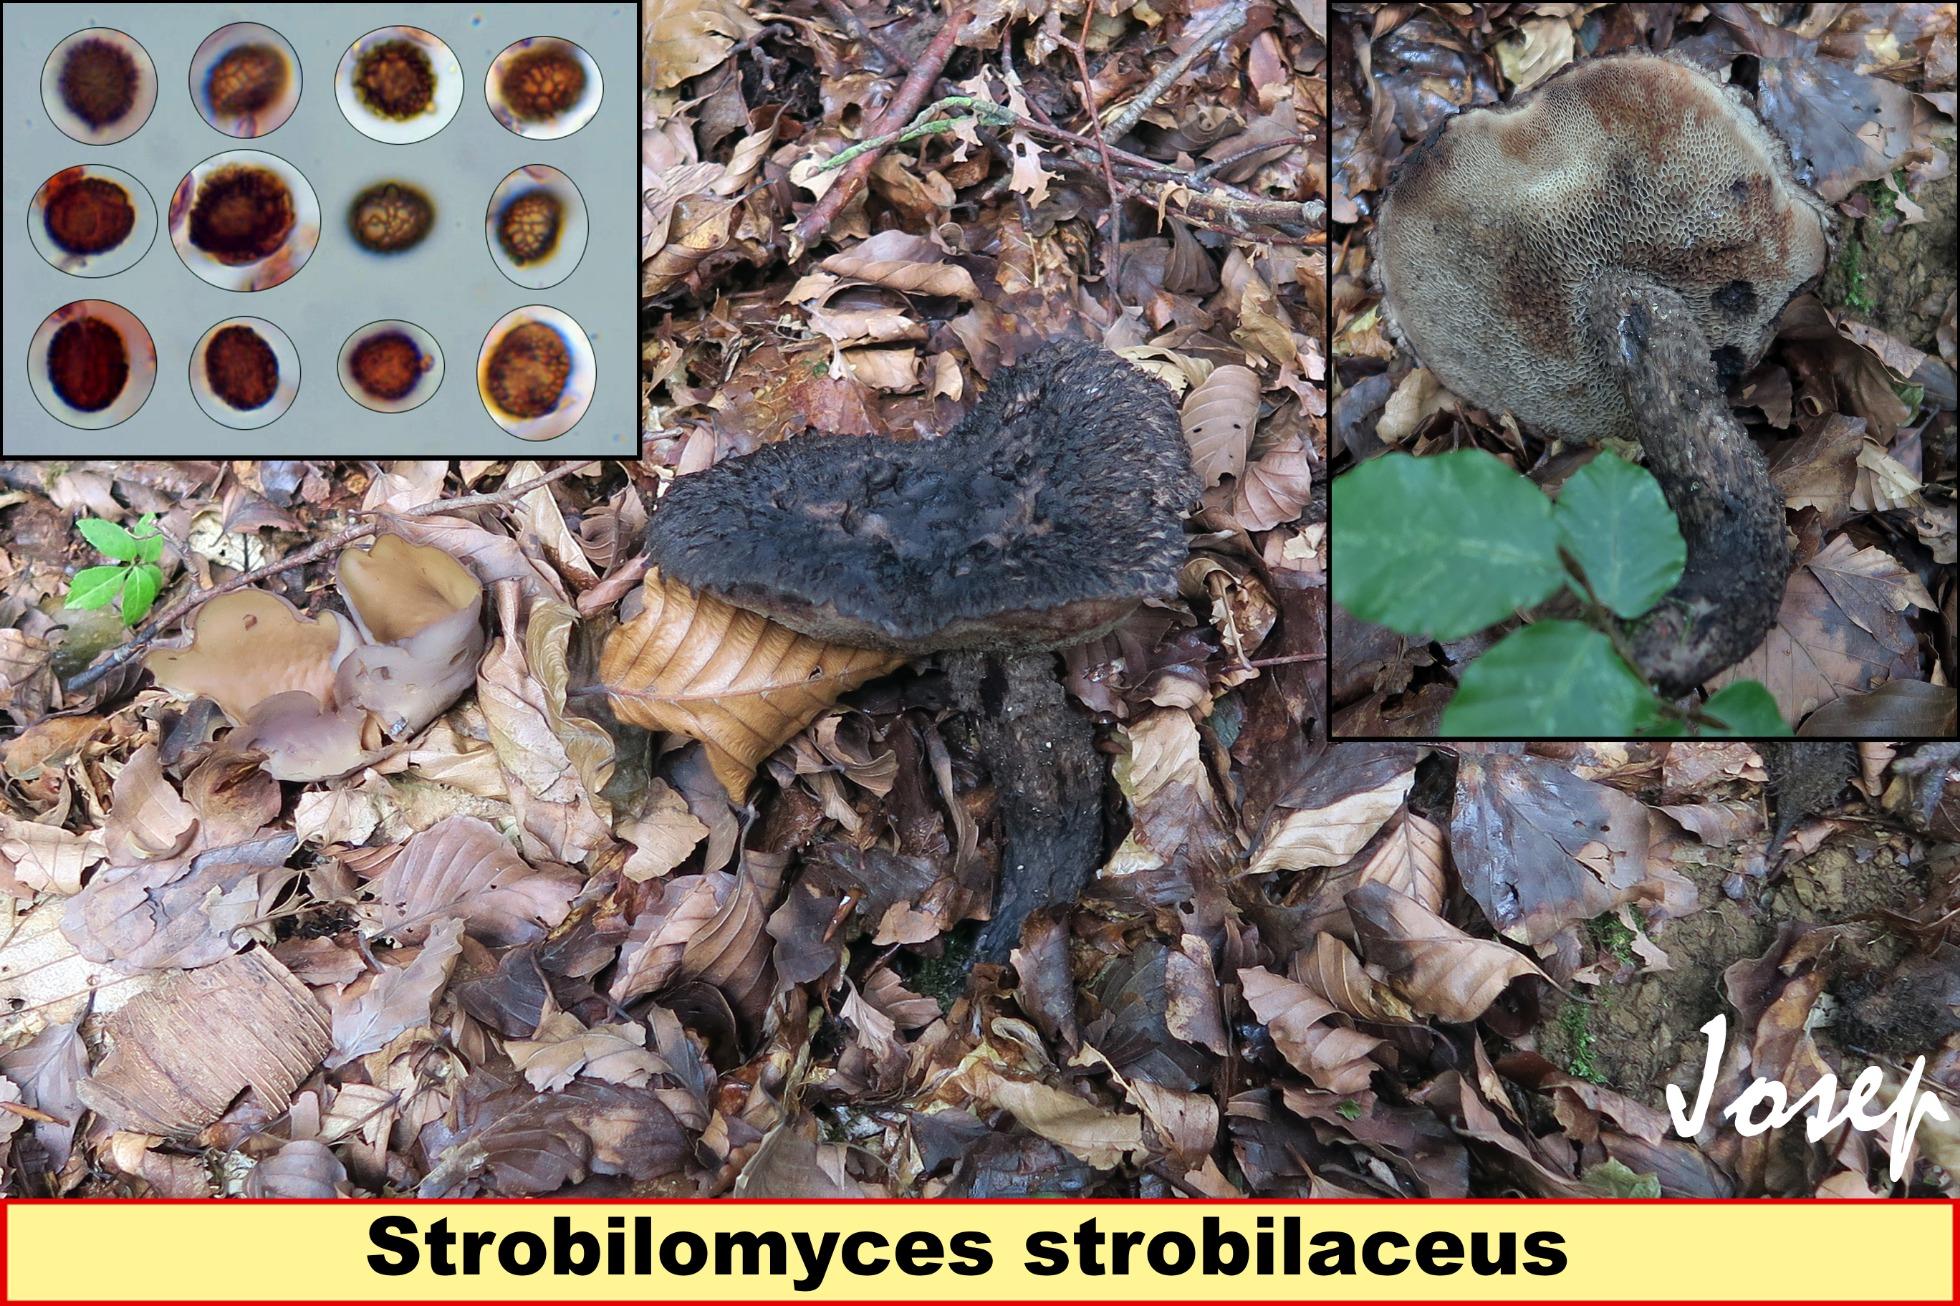 Strobilomycesstrobilaceus_2018-10-15.jpg